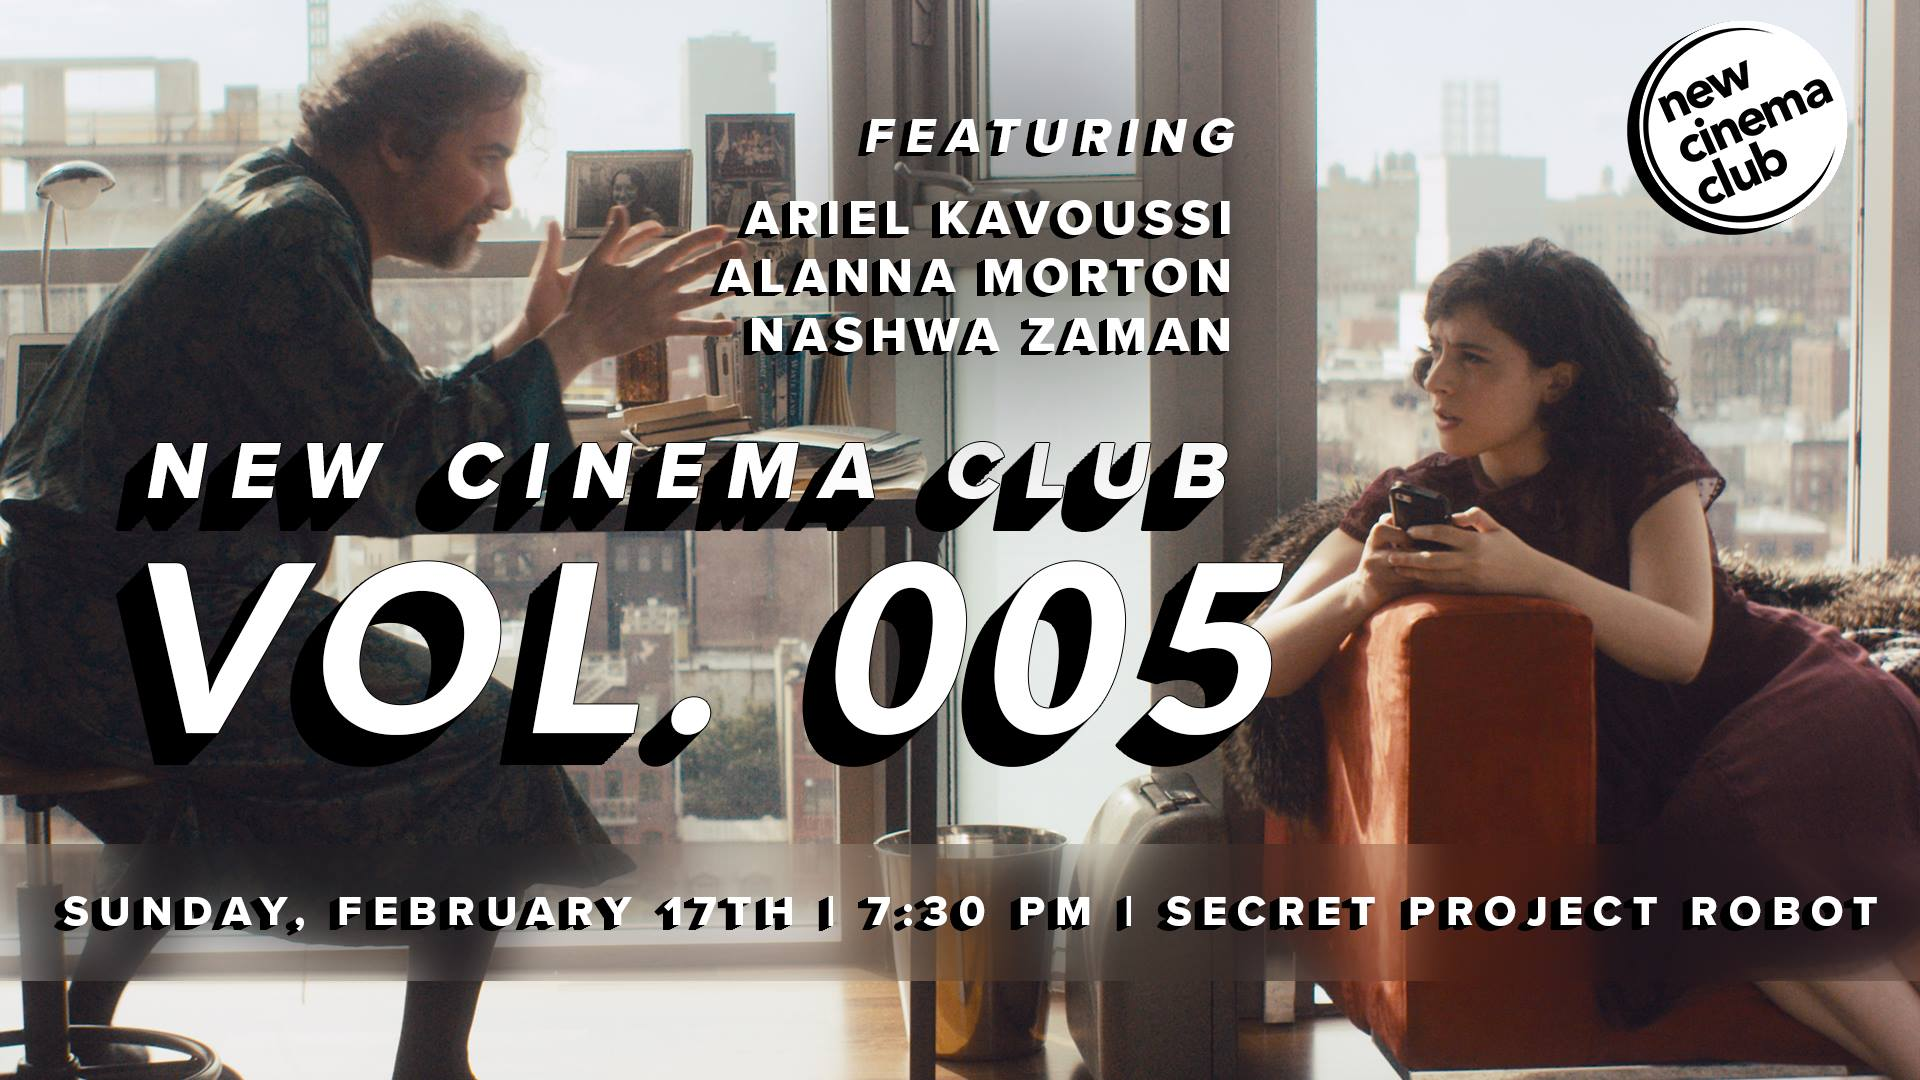 New Cinema Club - Vol. 005